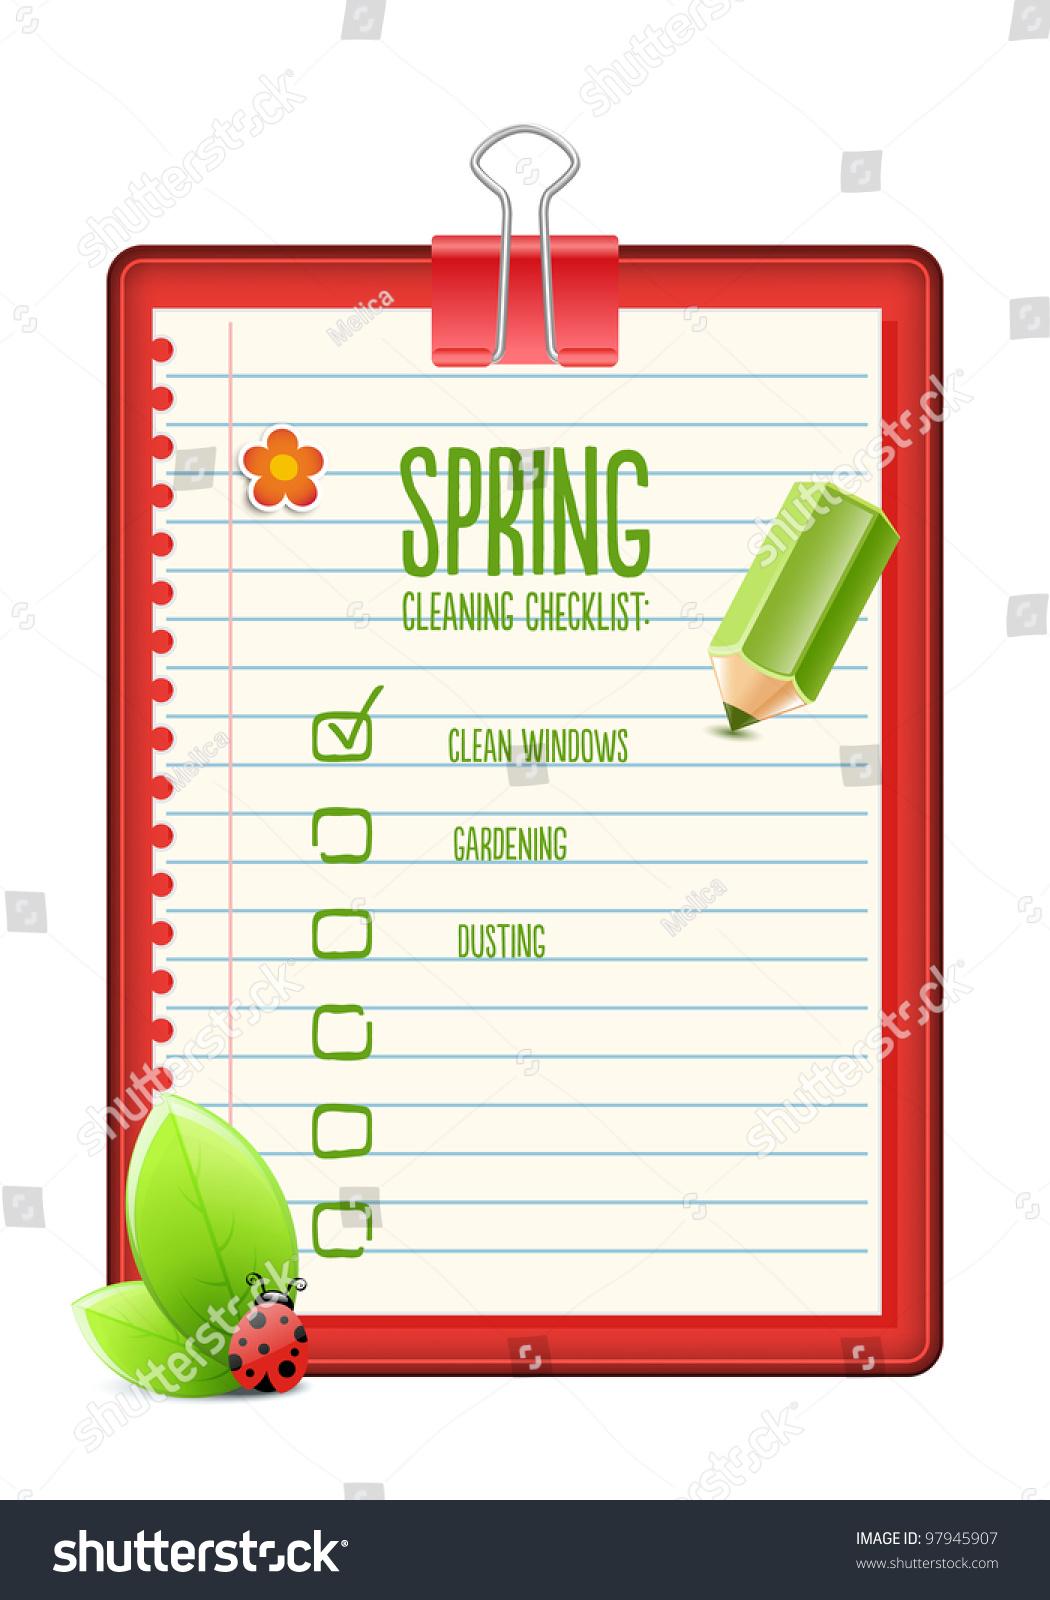 Spring Cleaning Checklist Illustration Vector 97945907 – Sample Spring Cleaning Checklist